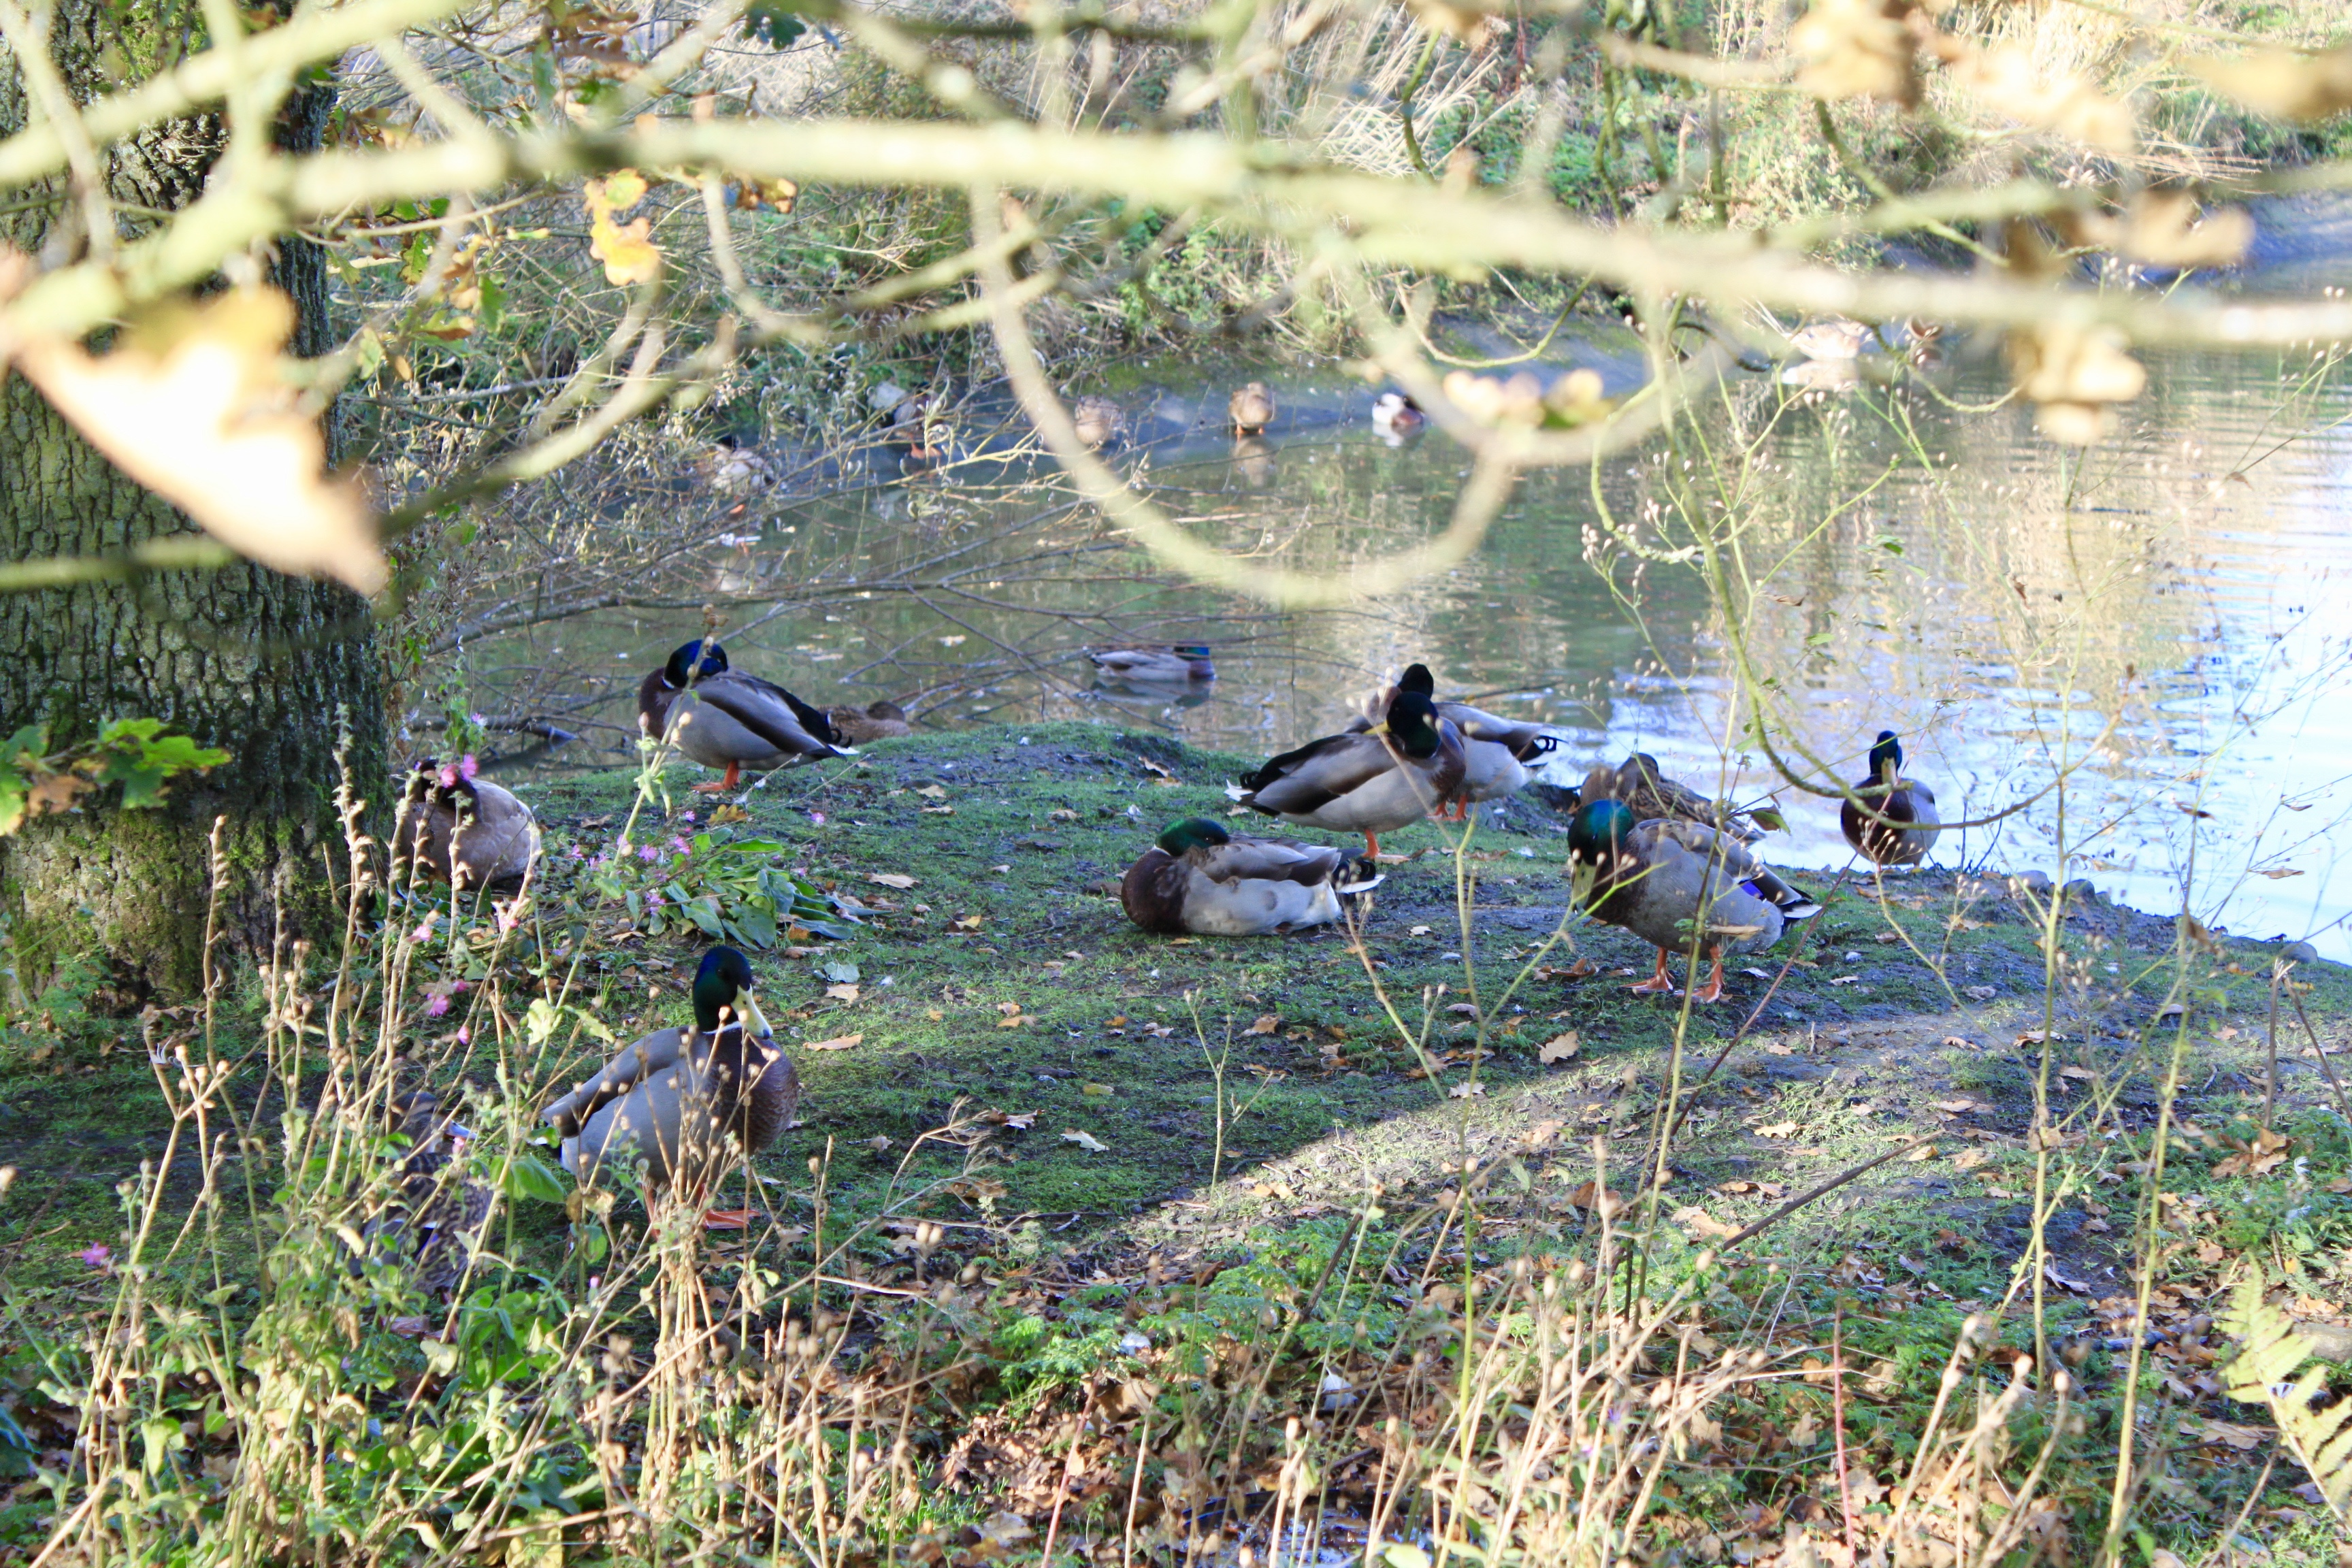 Mallard ducks by Jez Braithwaite at Palacerigg Country Park